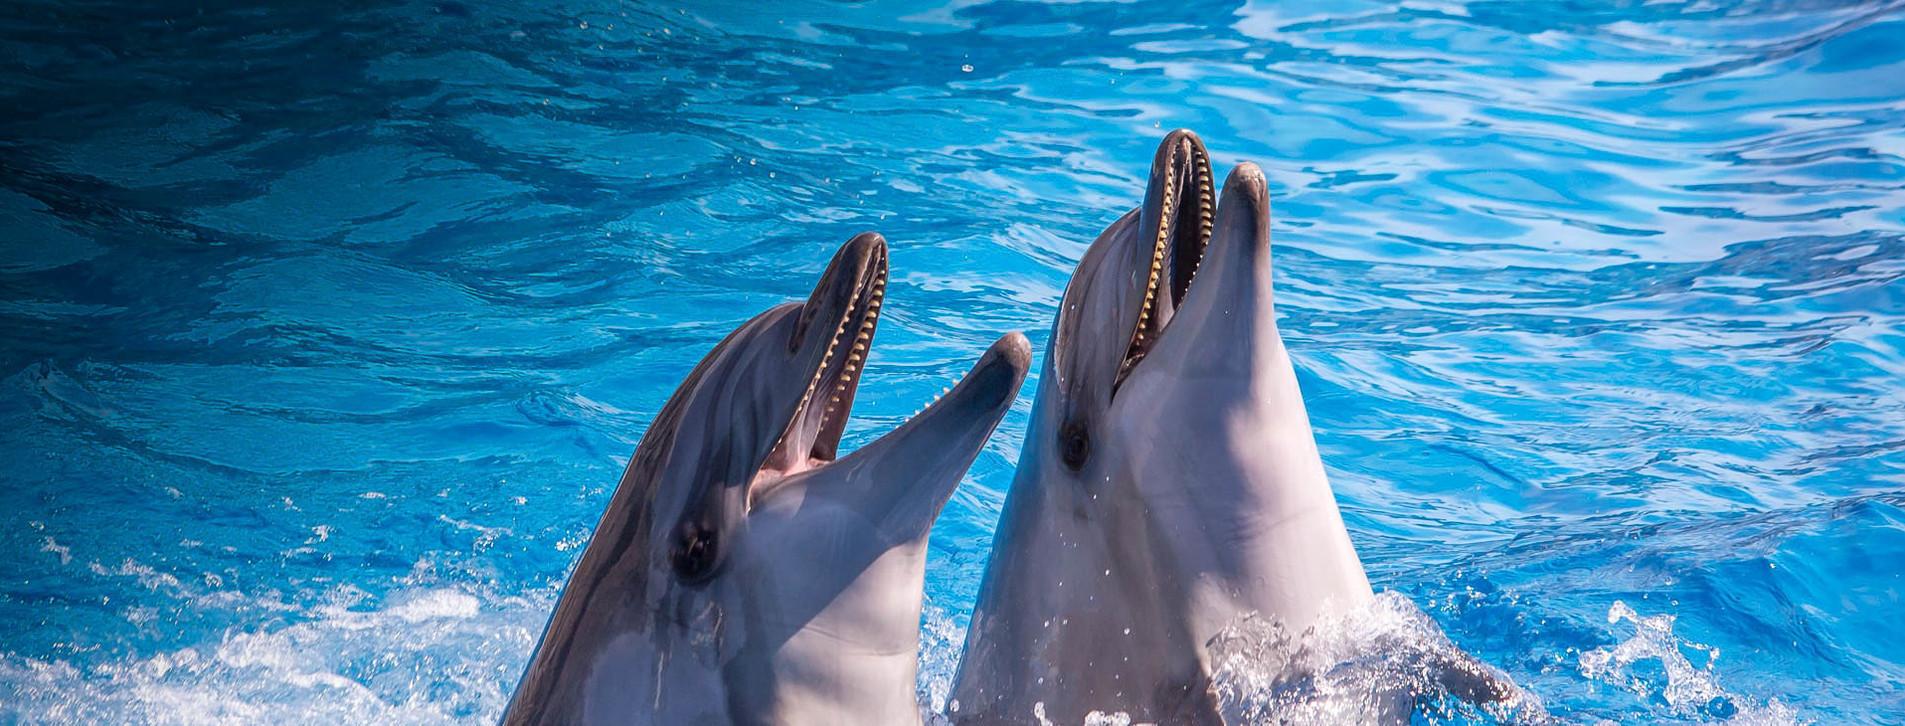 Фото 1 - Дельфинарий НЕМО